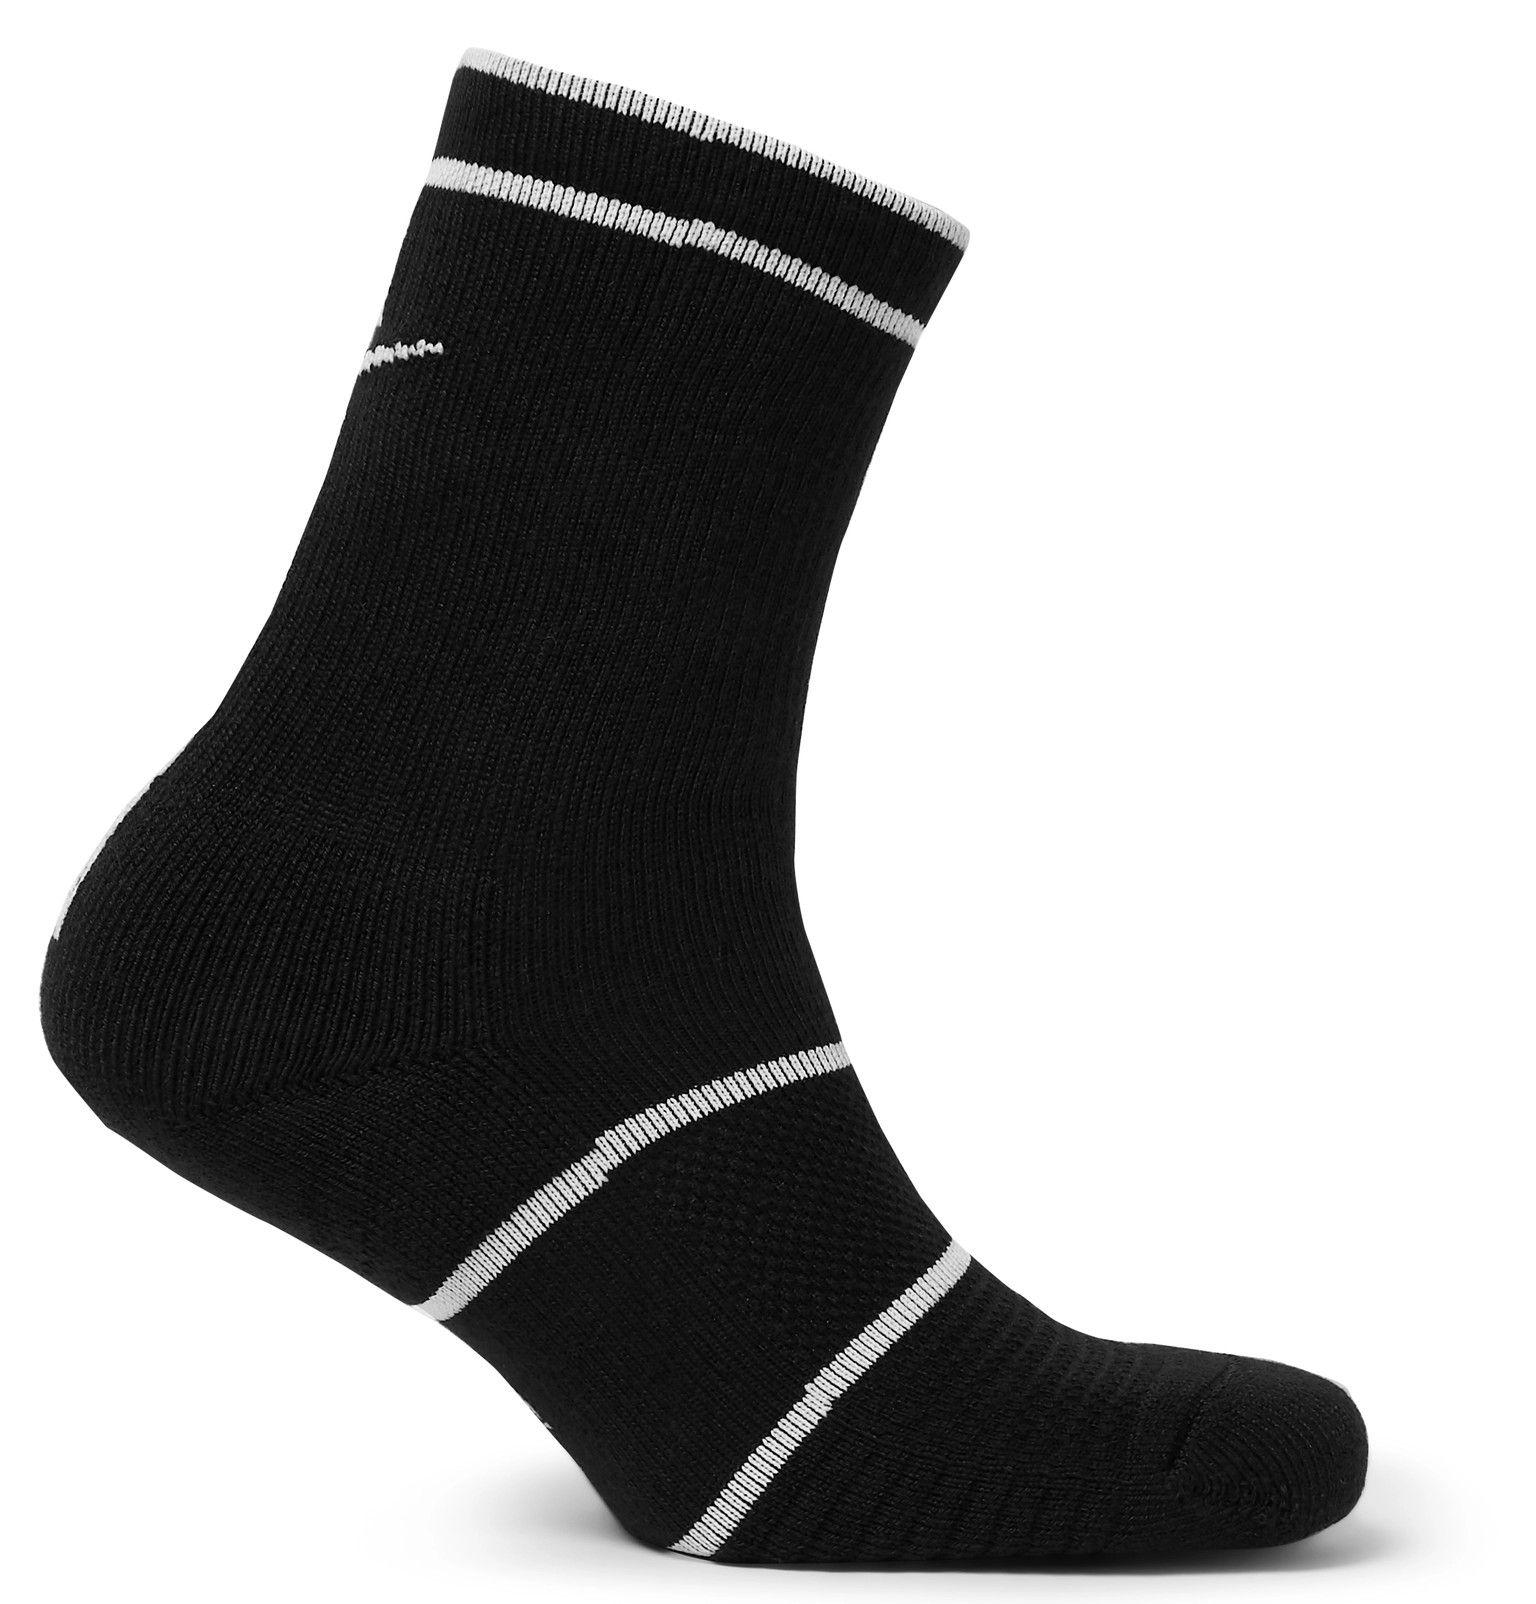 Nike Tennis Nikecourt Essentials Cushioned Dri Fit Tennis Socks Men Black Tennis Socks Nike Tennis Tennis